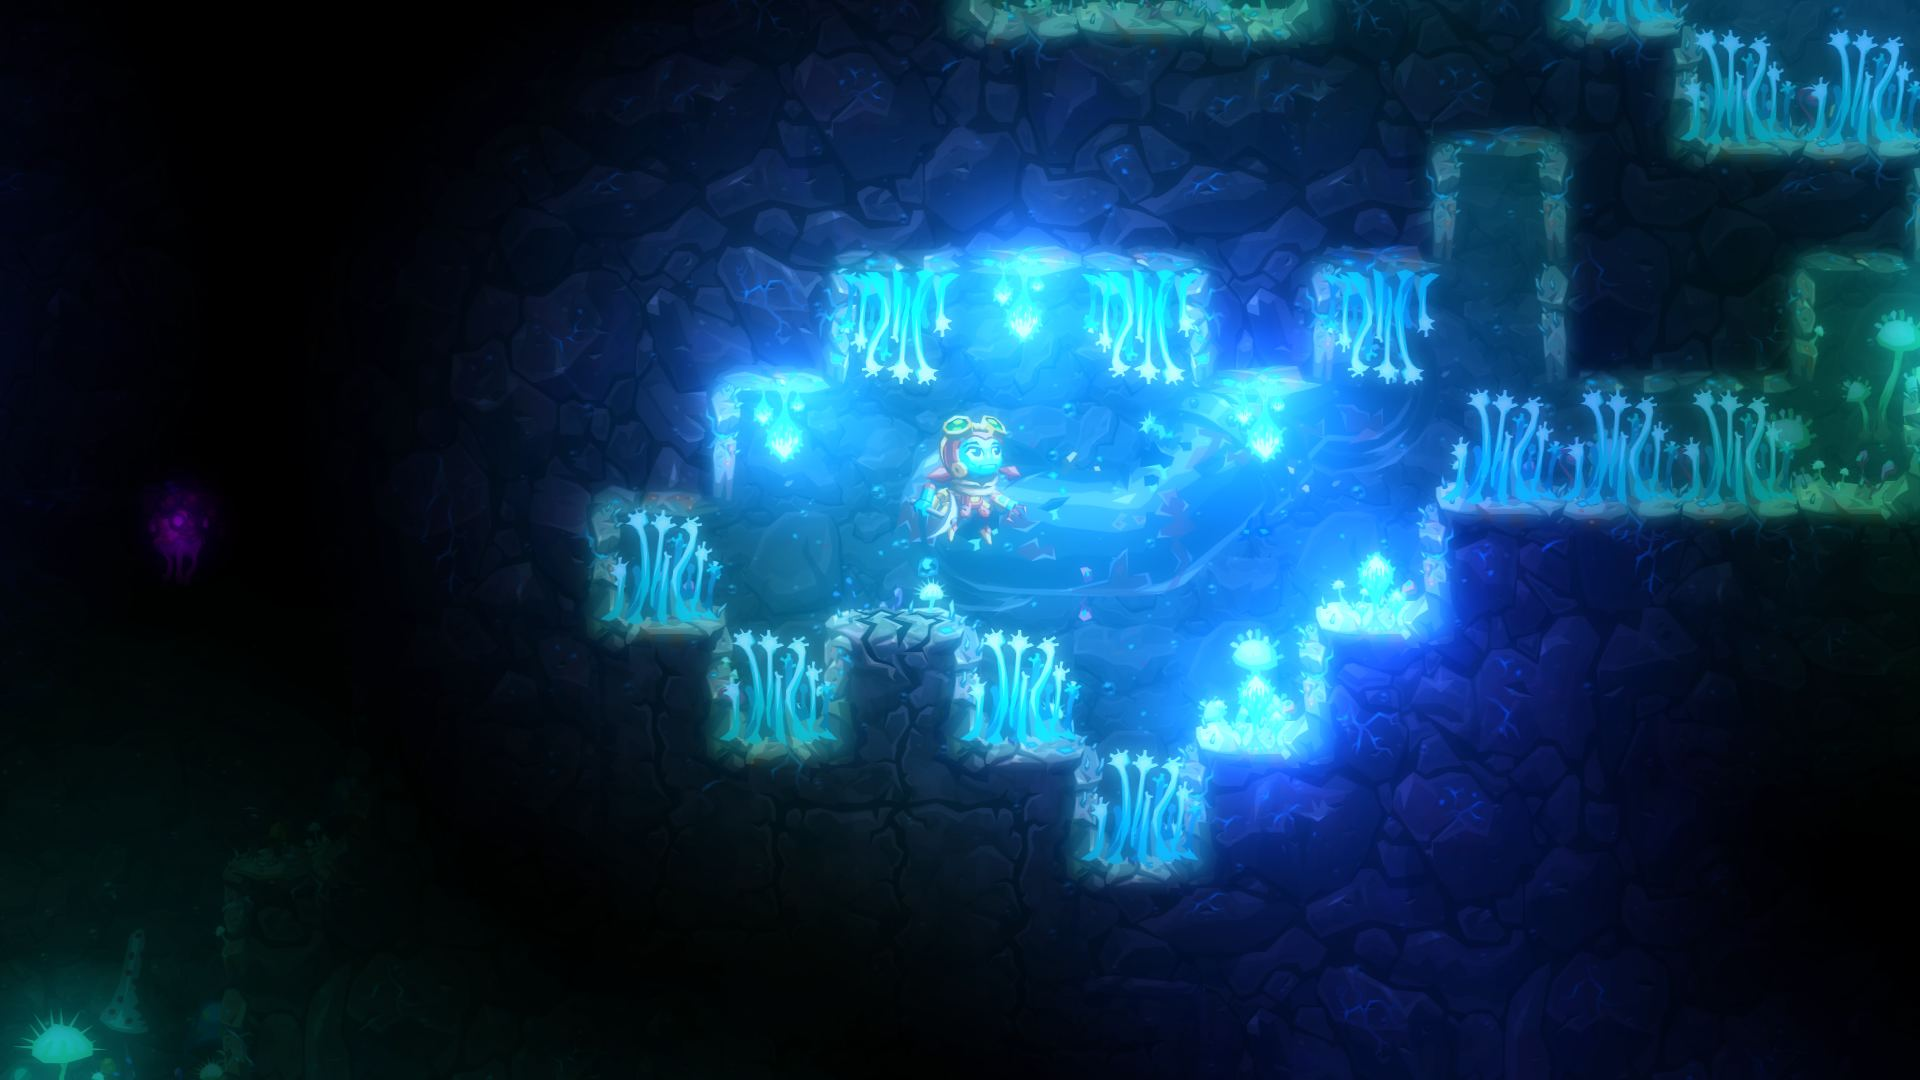 SteamWorld Dig 2 – Bild 1